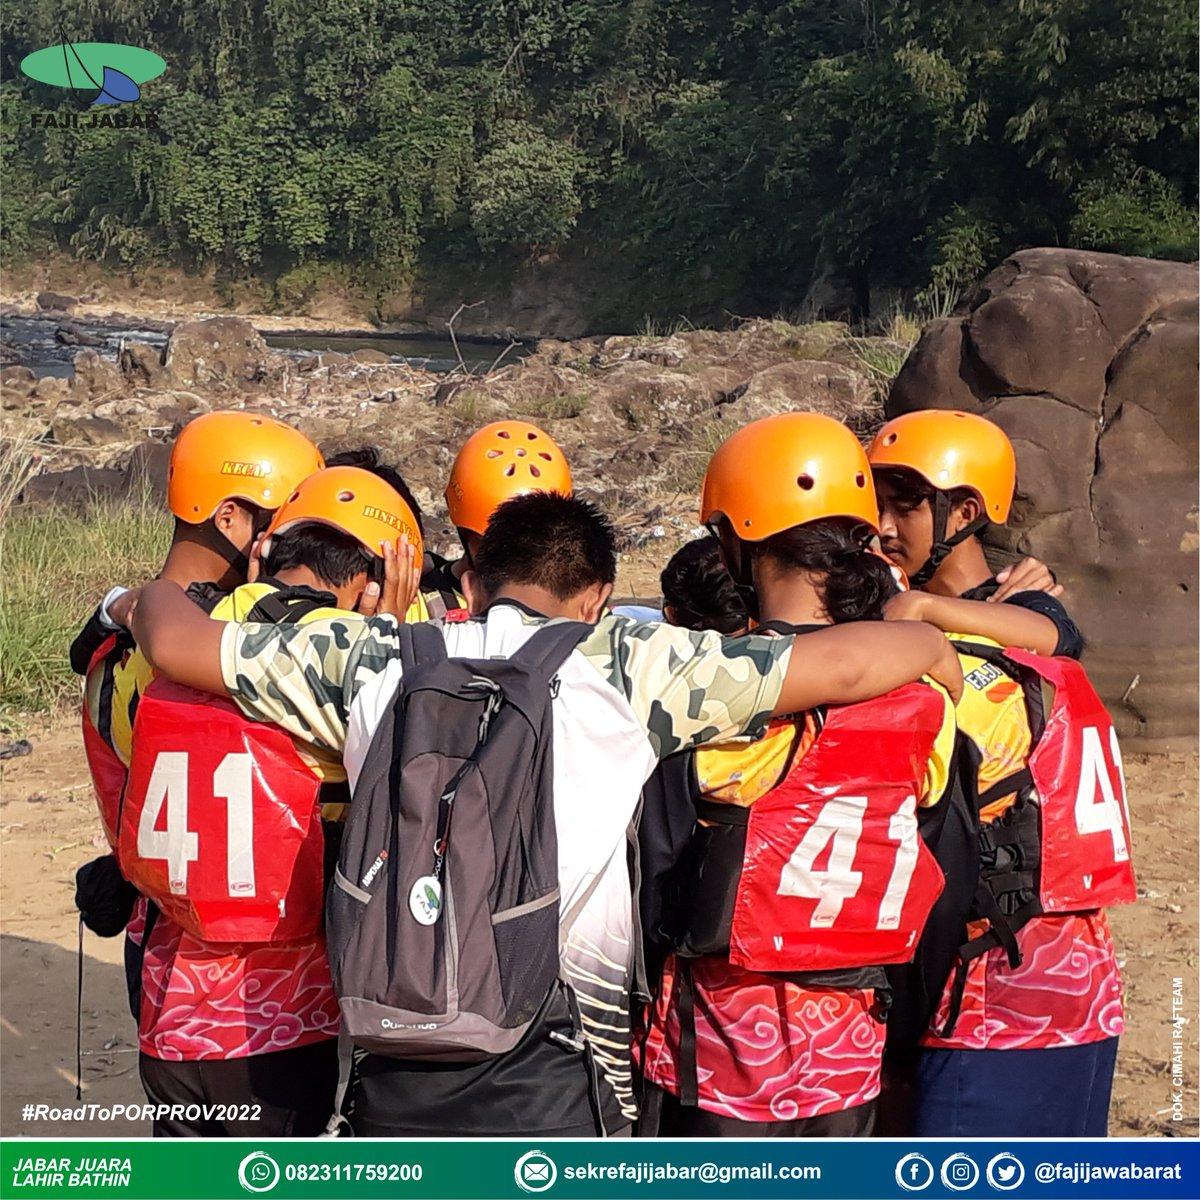 Awali dengan do'a bersama..  #TBT #RoadToPORPROV2022  Pekan Olahraga Daerah XIII Jawa Barat 2018, Sungai Cianten - Bogor - Jawa Barat.  📷 : @cimahi.rafteam  #CimahiRafteam #FAJIJABAR #ArungJeram #JawaBarat#Ngahiji #KuduMenang #JabarJuara#JuaraLahirBathin #Rafting